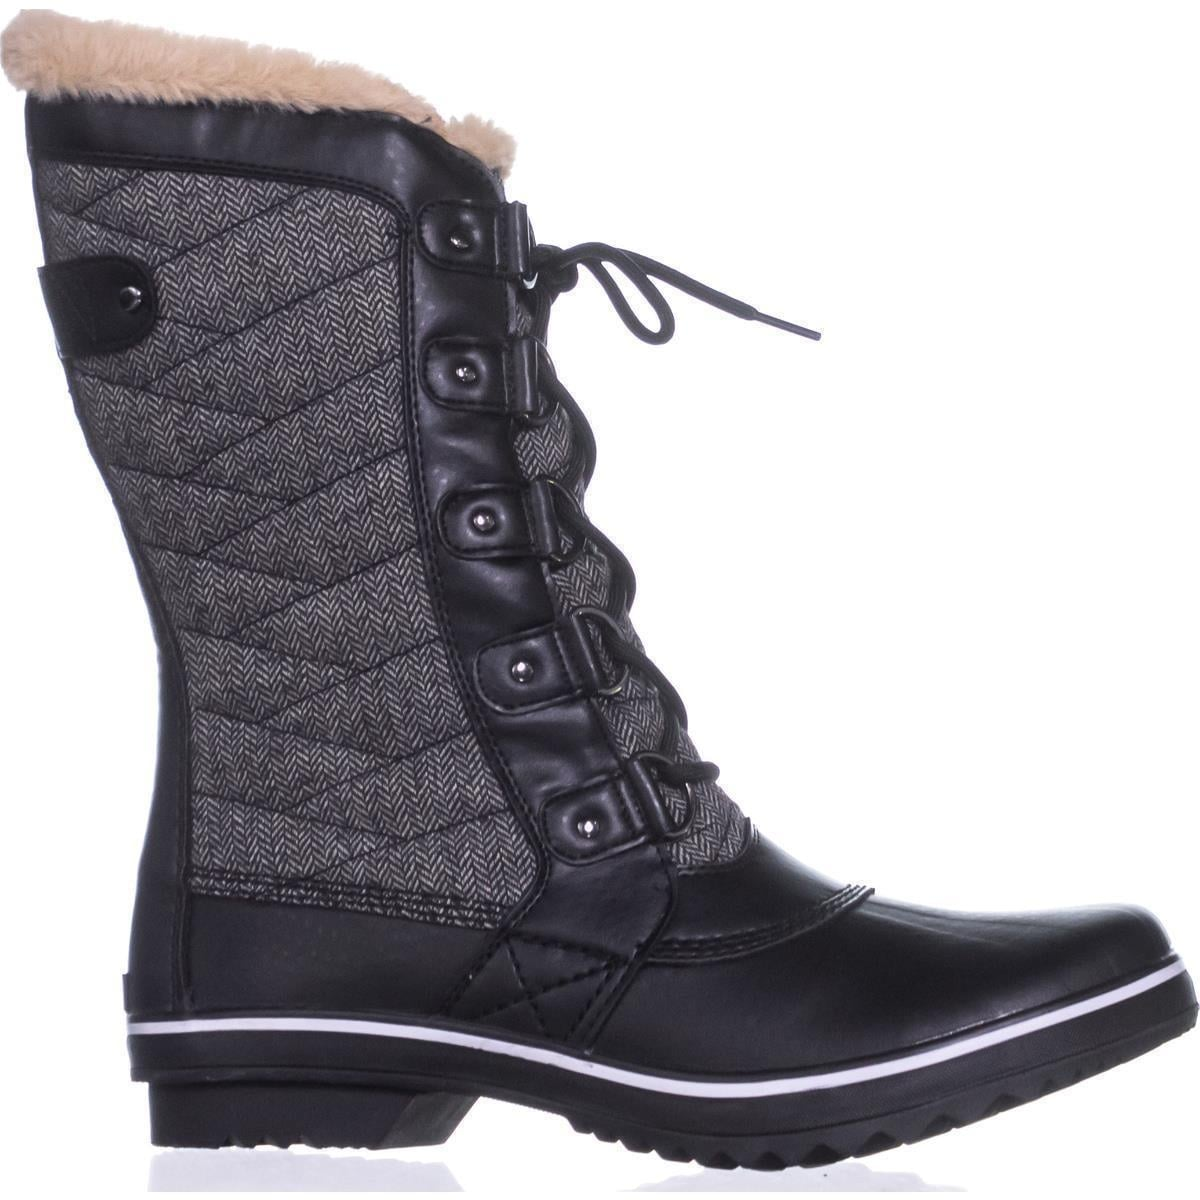 efca5990b Shop JBU by Jambu Lorna Cold-Weather Boots, Herringbone Black - On Sale -  Free Shipping Today - Overstock - 19739880